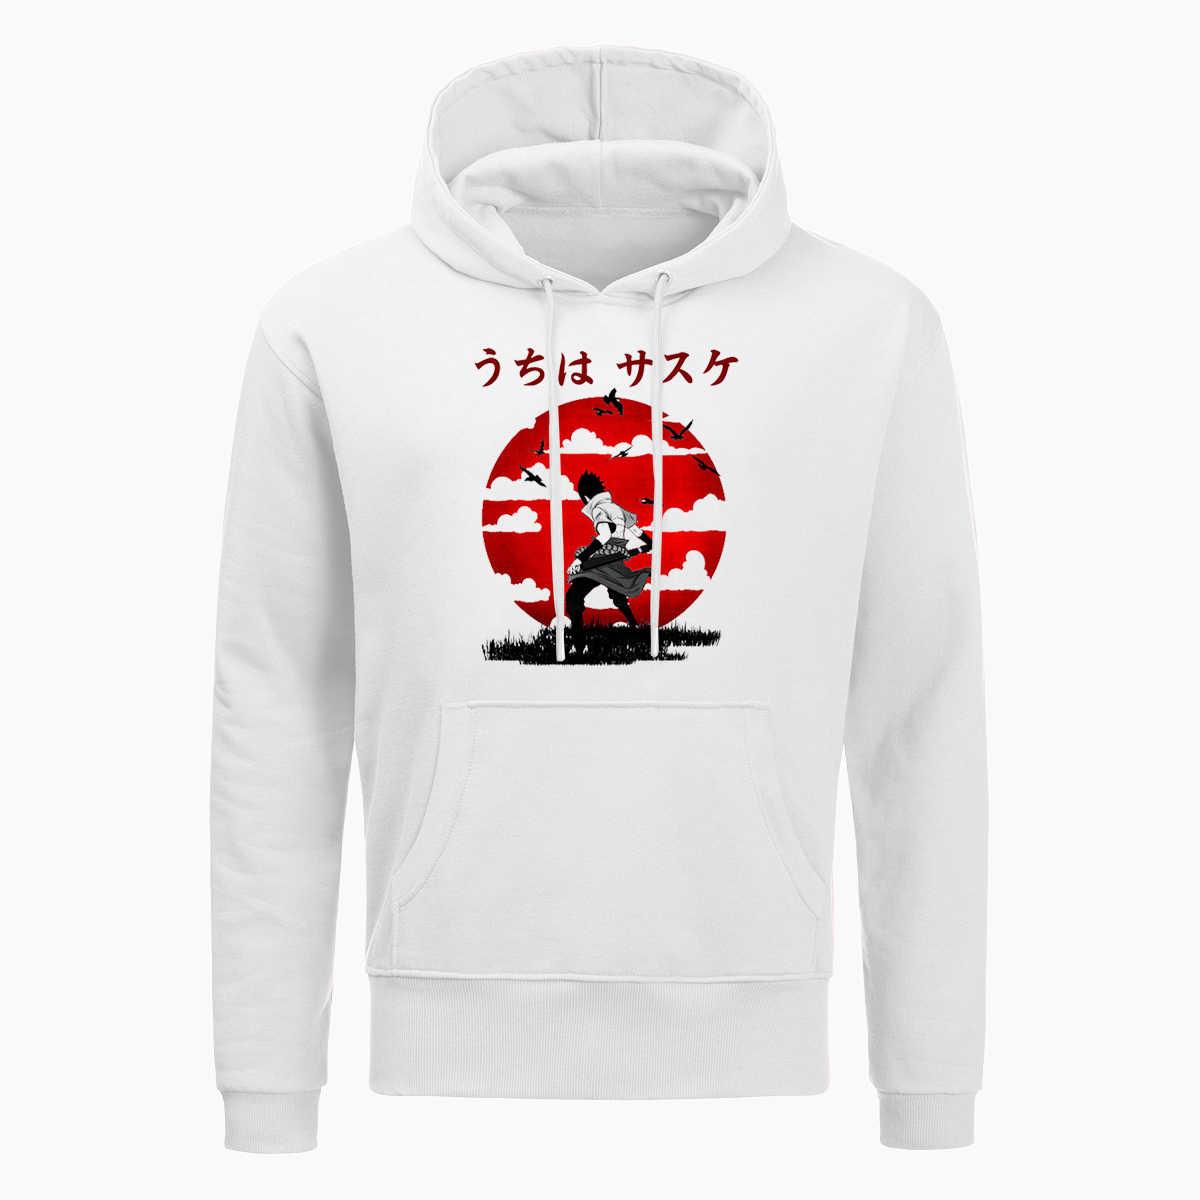 Harajuku Naruto Uchiha Sasuke Itachi Hoodies Männer Japan Anime Hoodie Lustige Sunset Sweatshirt Winter Fleece Pullover Hip Hop Tops